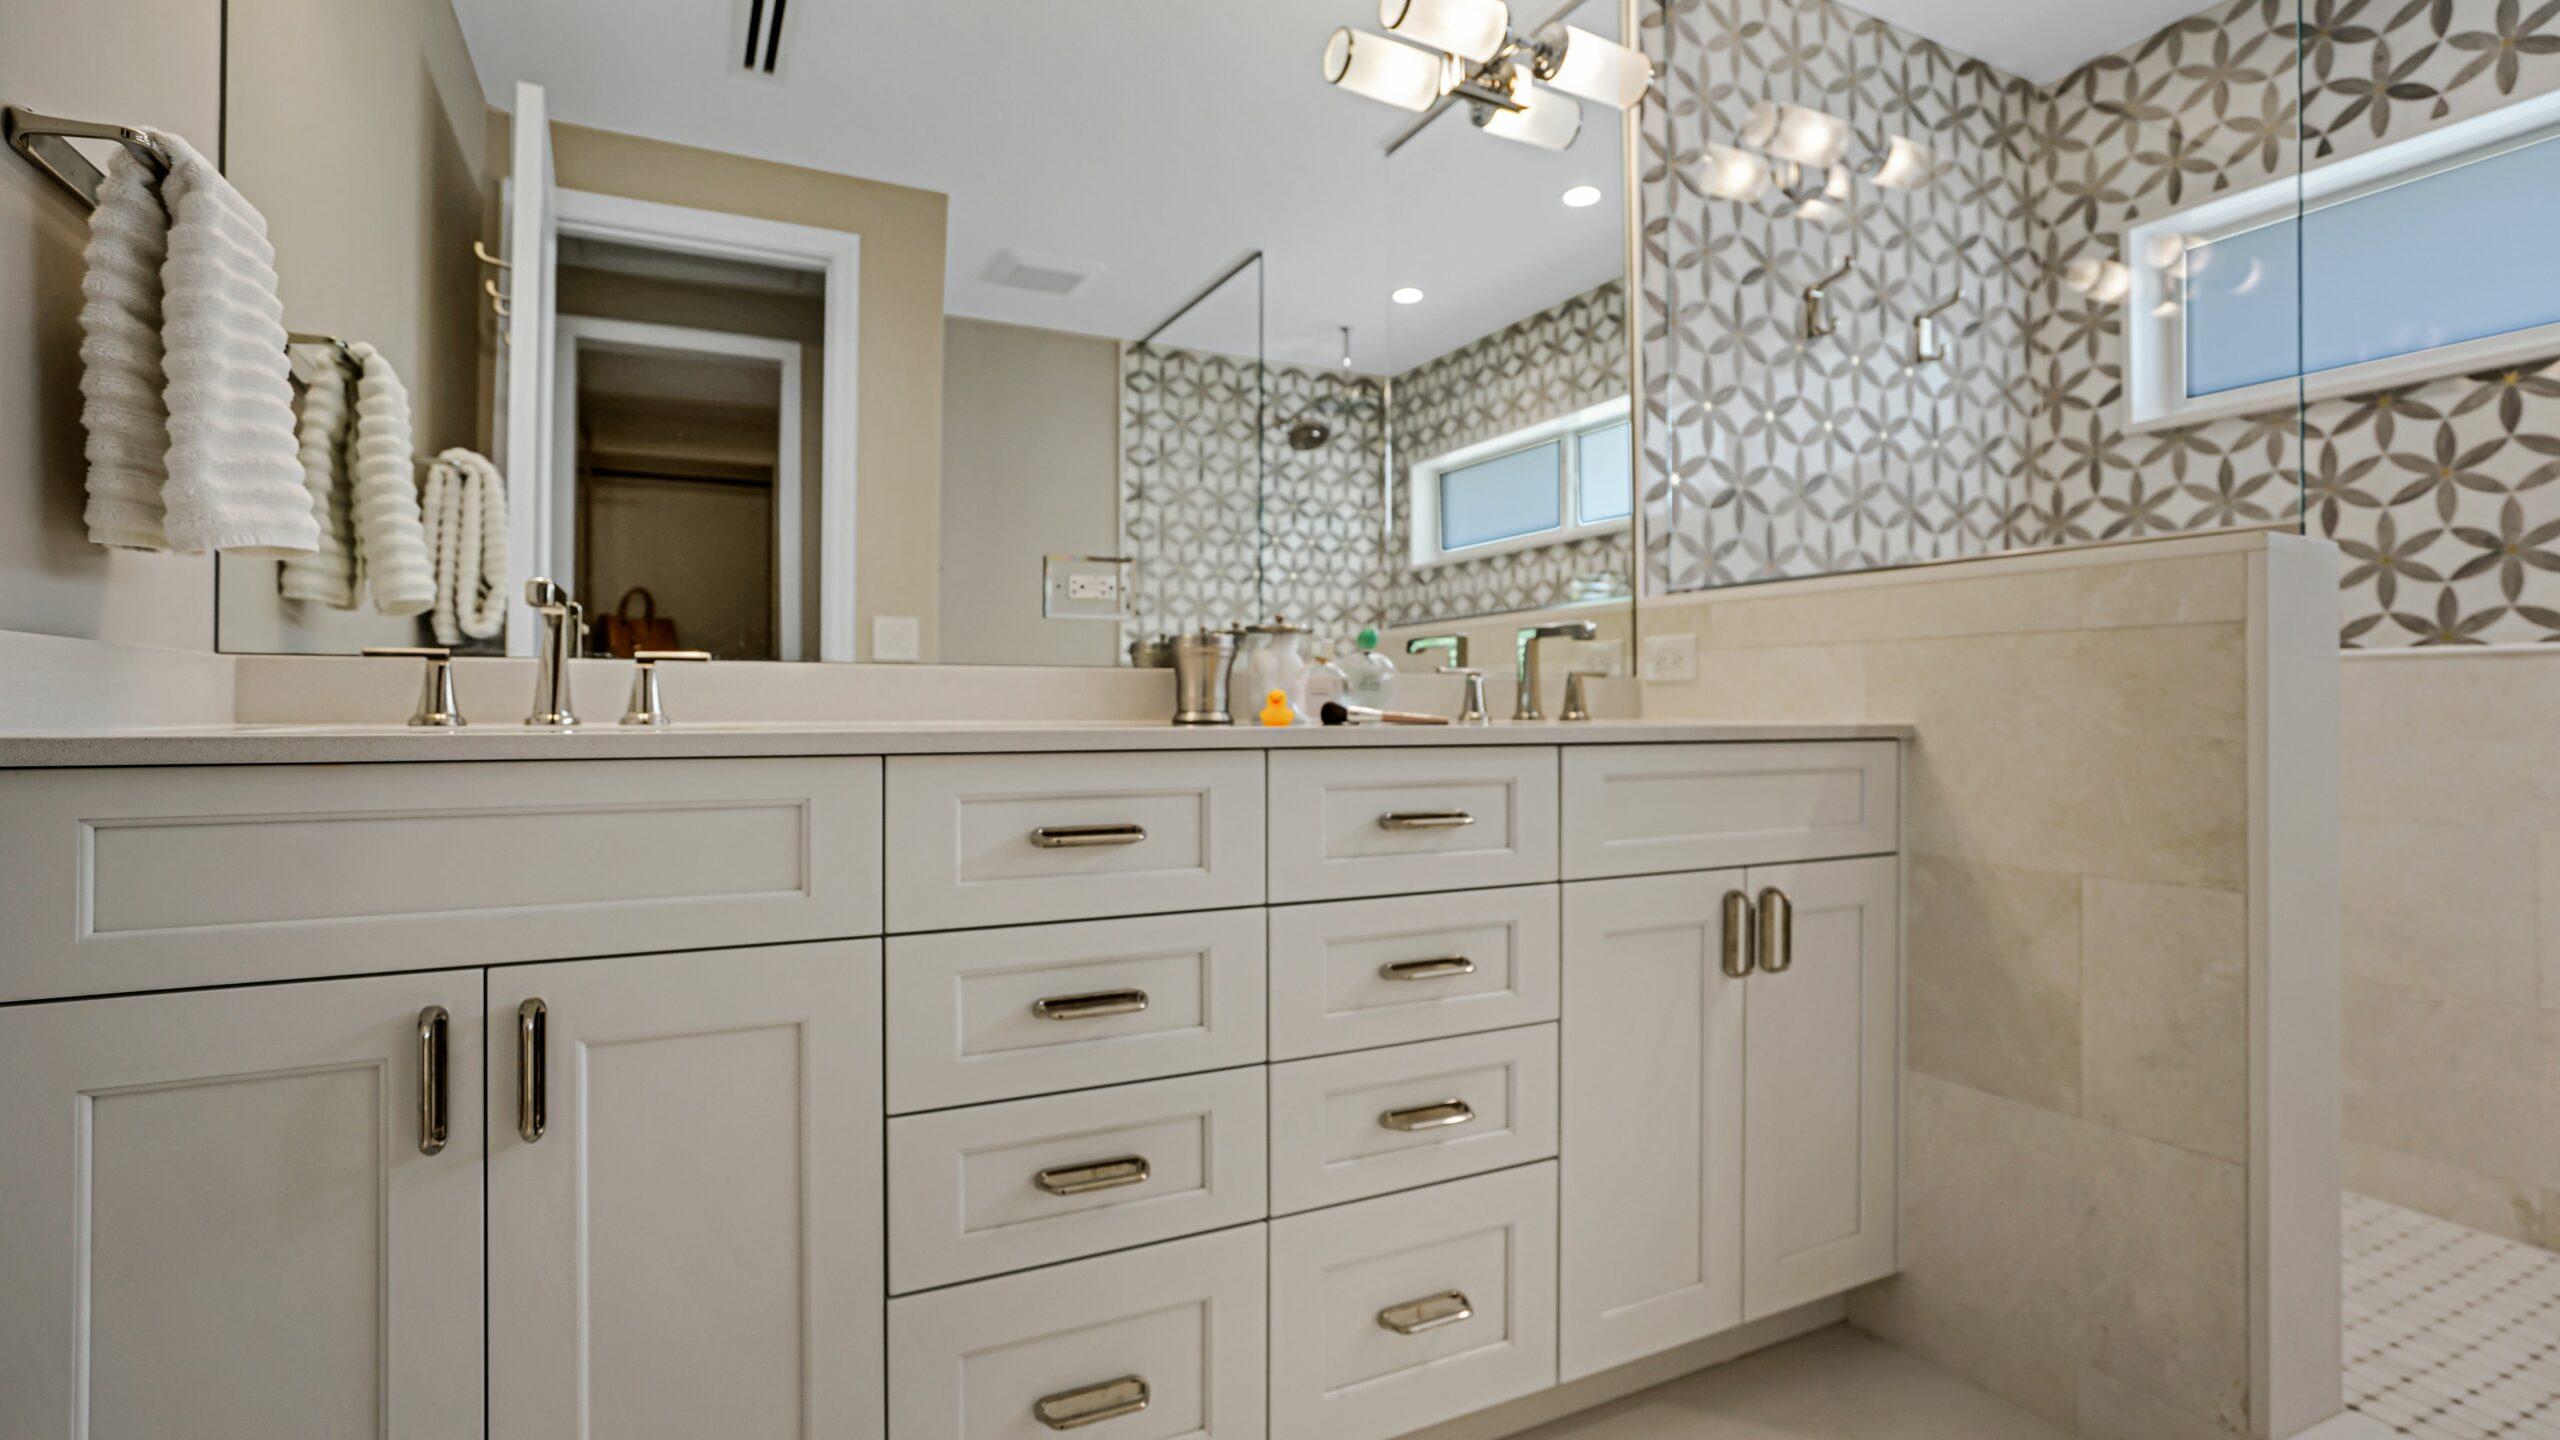 Bathroom Remodeling in Miami, Key Largo, Miami Lakes, South Miami, Miami Beach, and Palmetto Bay